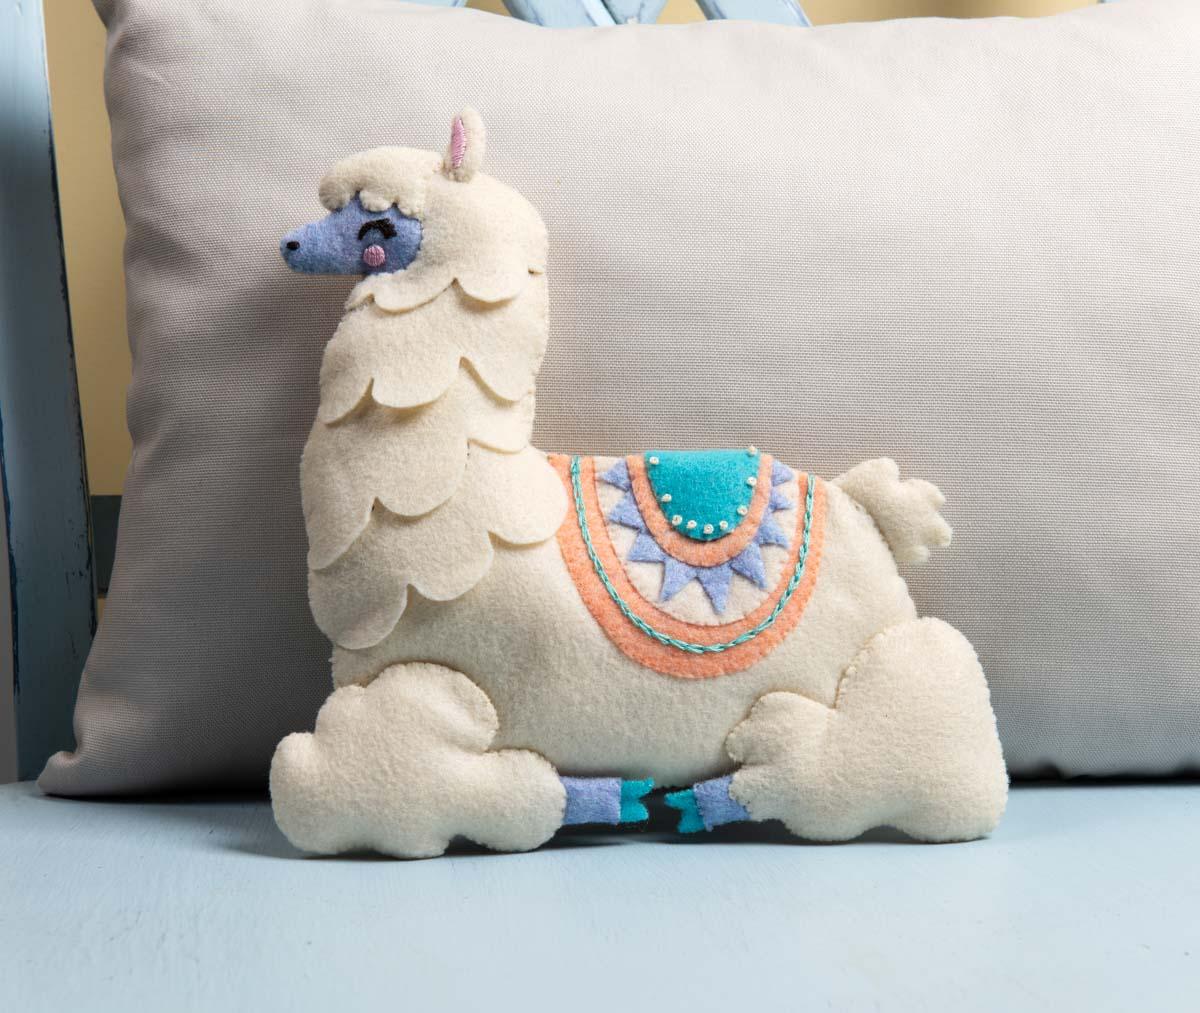 Bucilla ® Baby - Felt - Crib Ensembles - Llama Baby - Pillow - 47889E